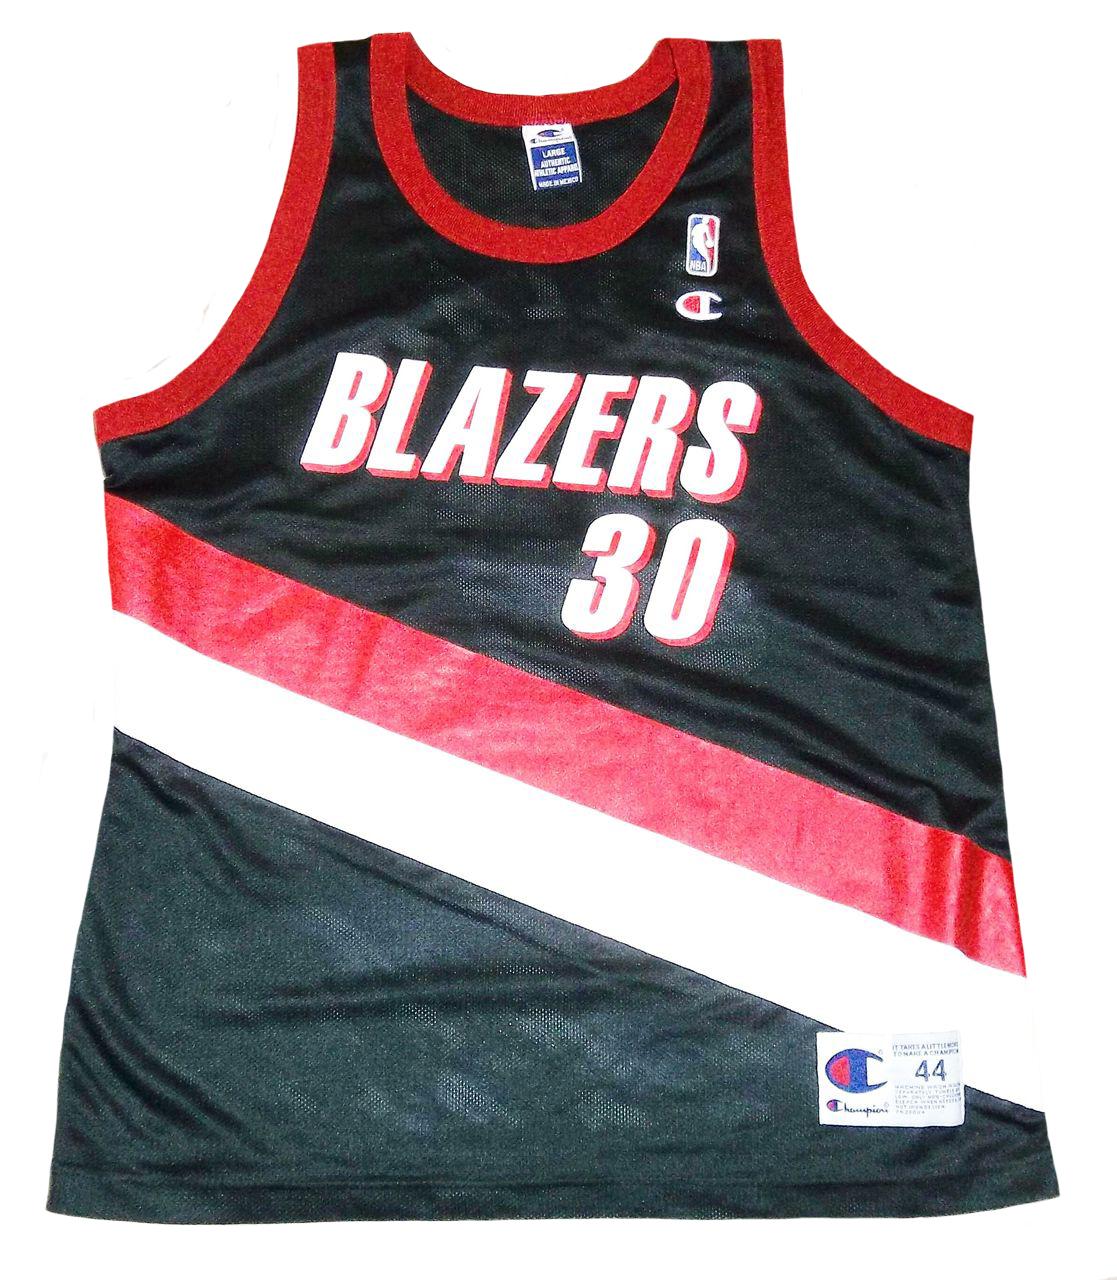 Champion Blogger - Champion NBA Jersey Archive